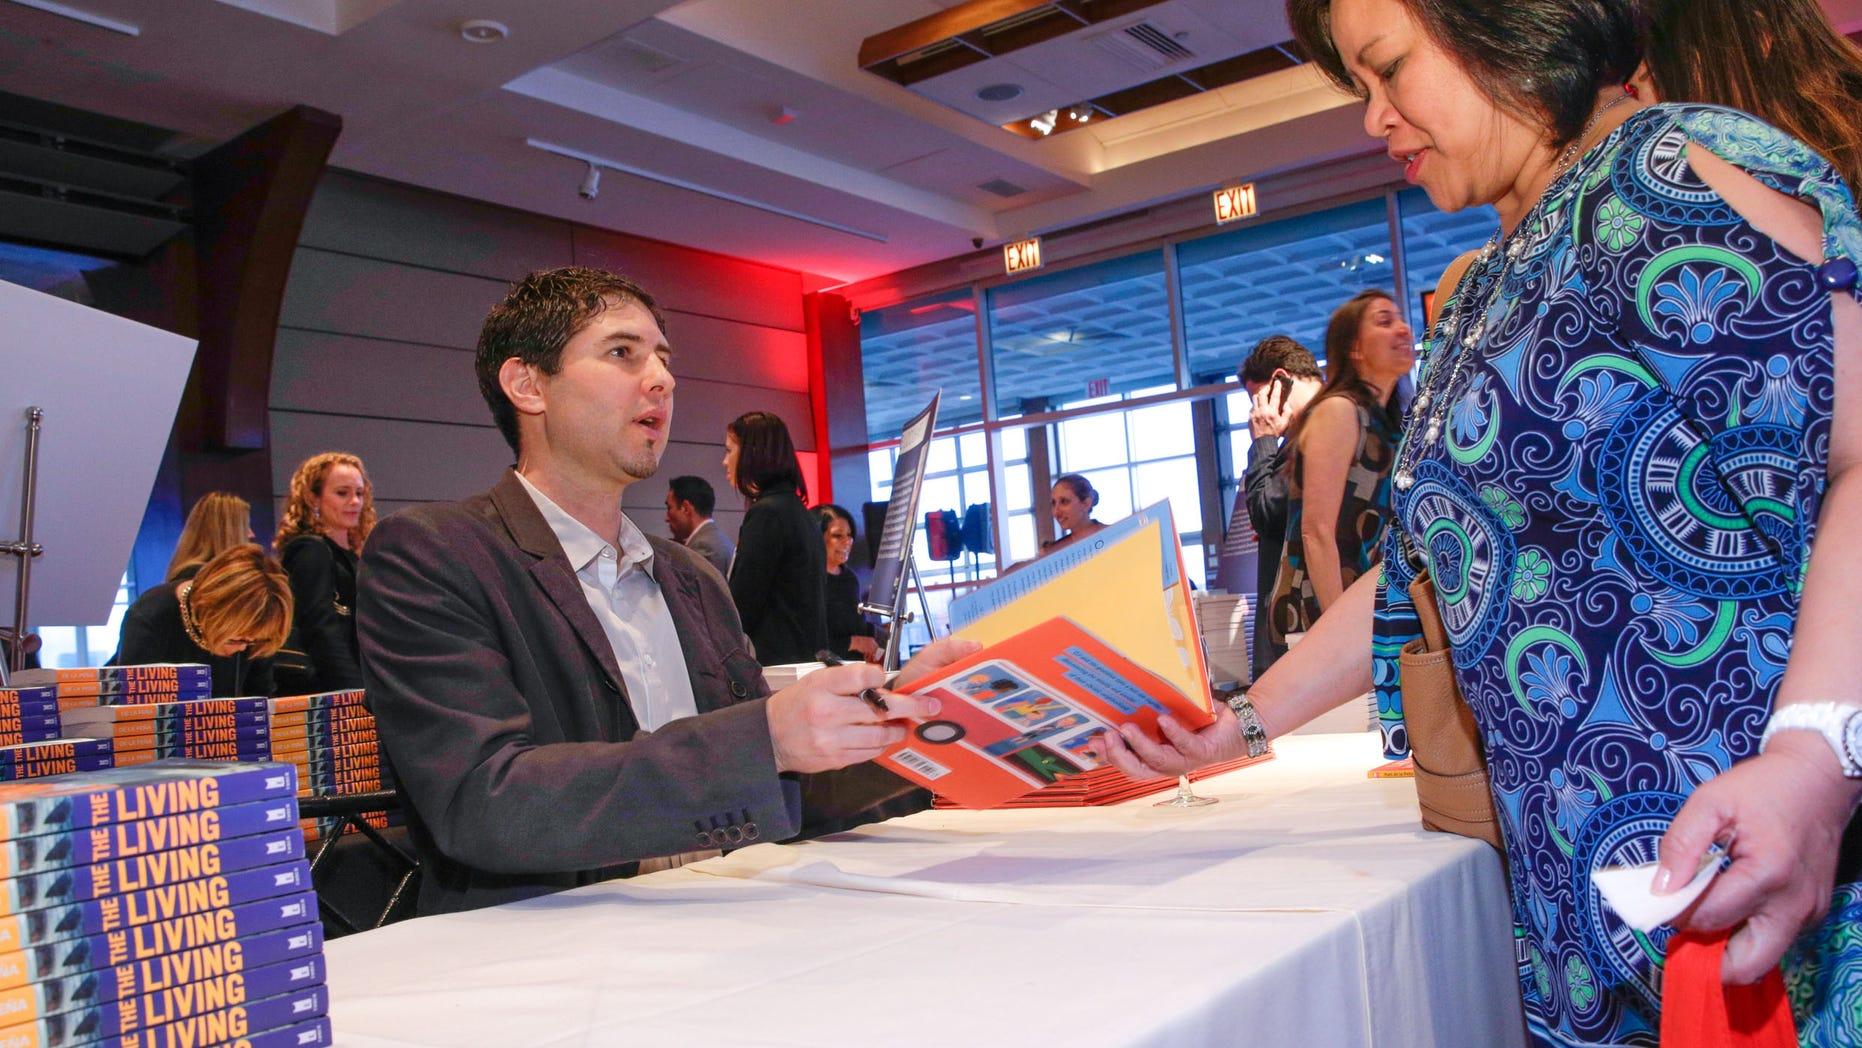 Author Matt De La Pena in a book signing on April 16, 2015 in New York City.